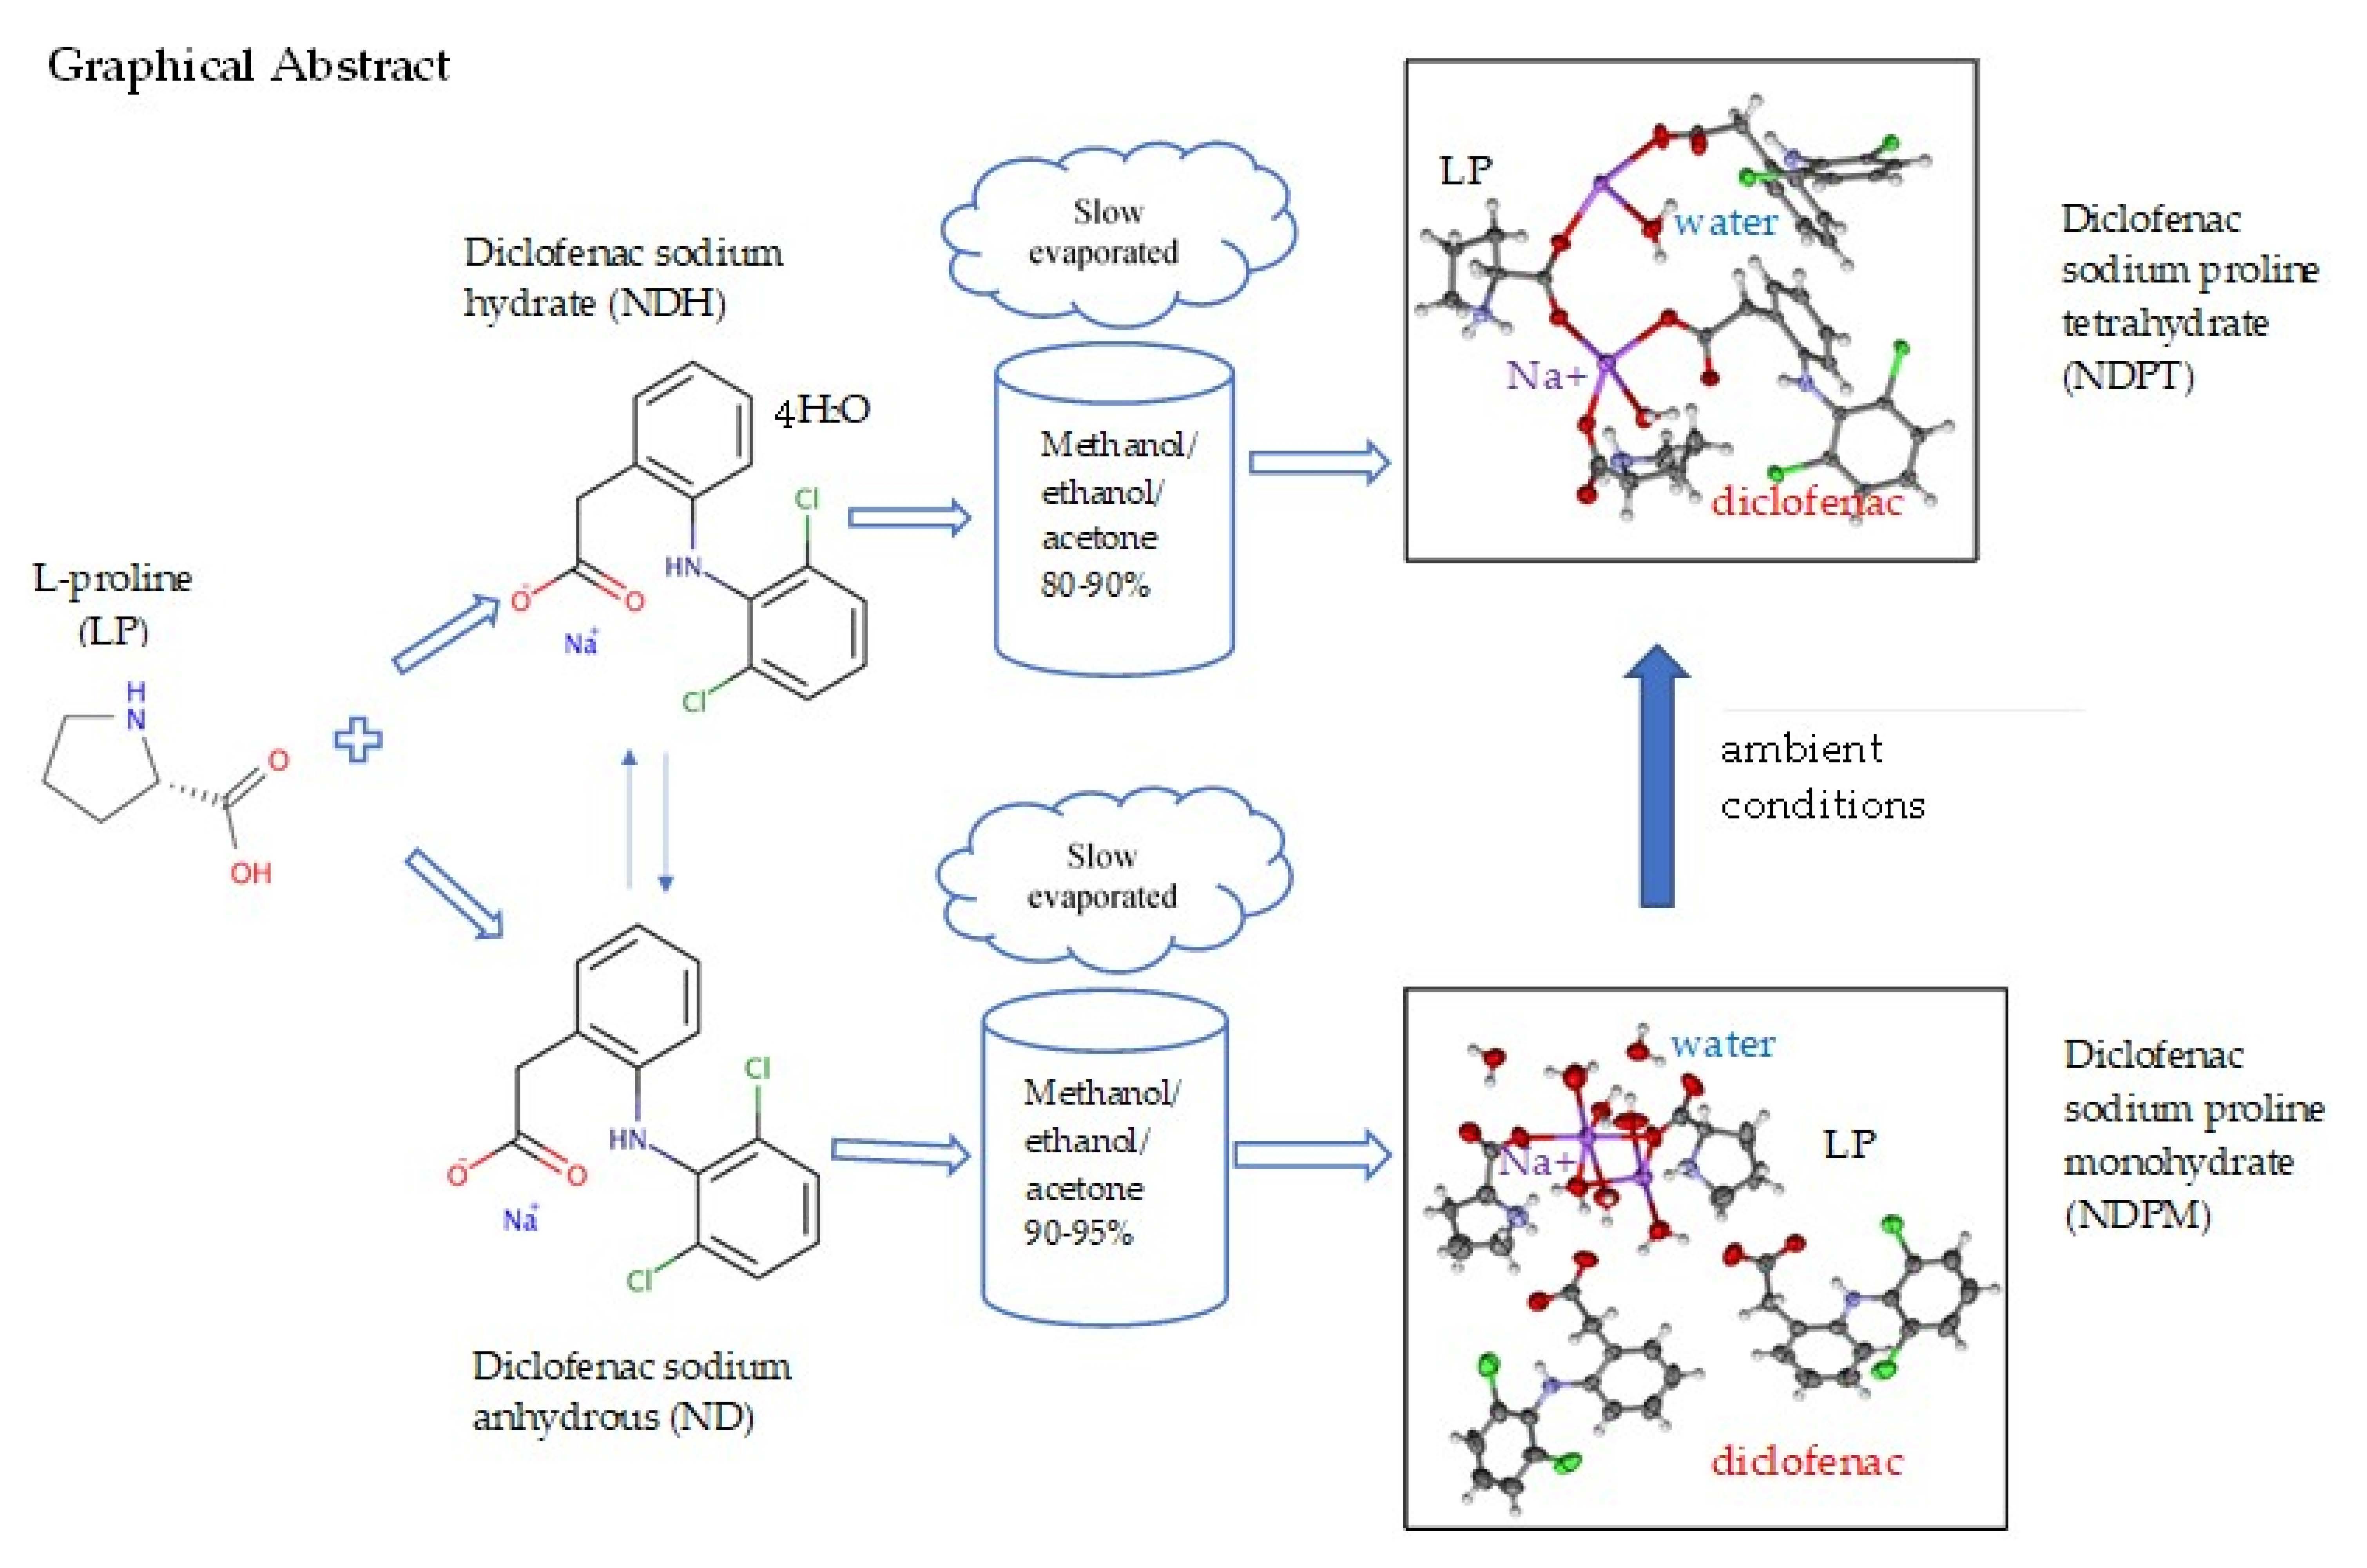 Pharmaceutics Free Full Text Salt Cocrystal Of Diclofenac Sodium L Proline Structural Pseudopolymorphism And Pharmaceutics Performance Study Html